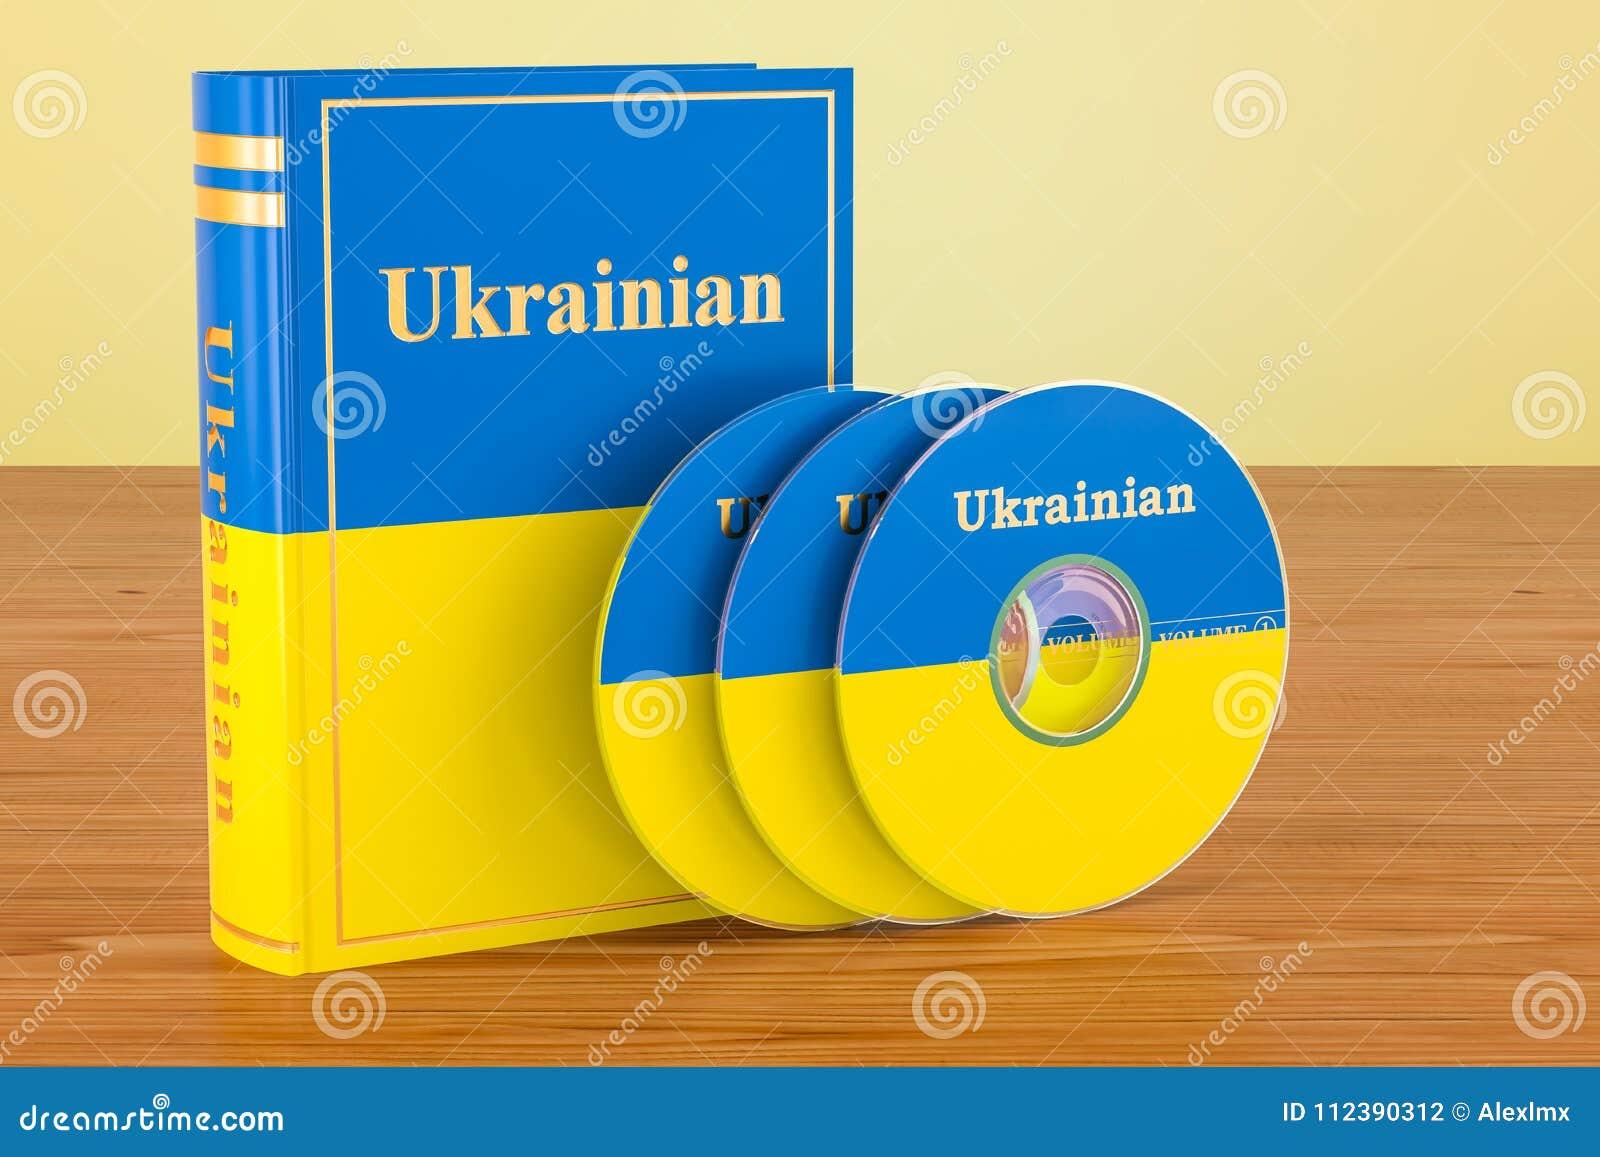 Ukrainian language textbook with flag of Ukraine and CD discs on